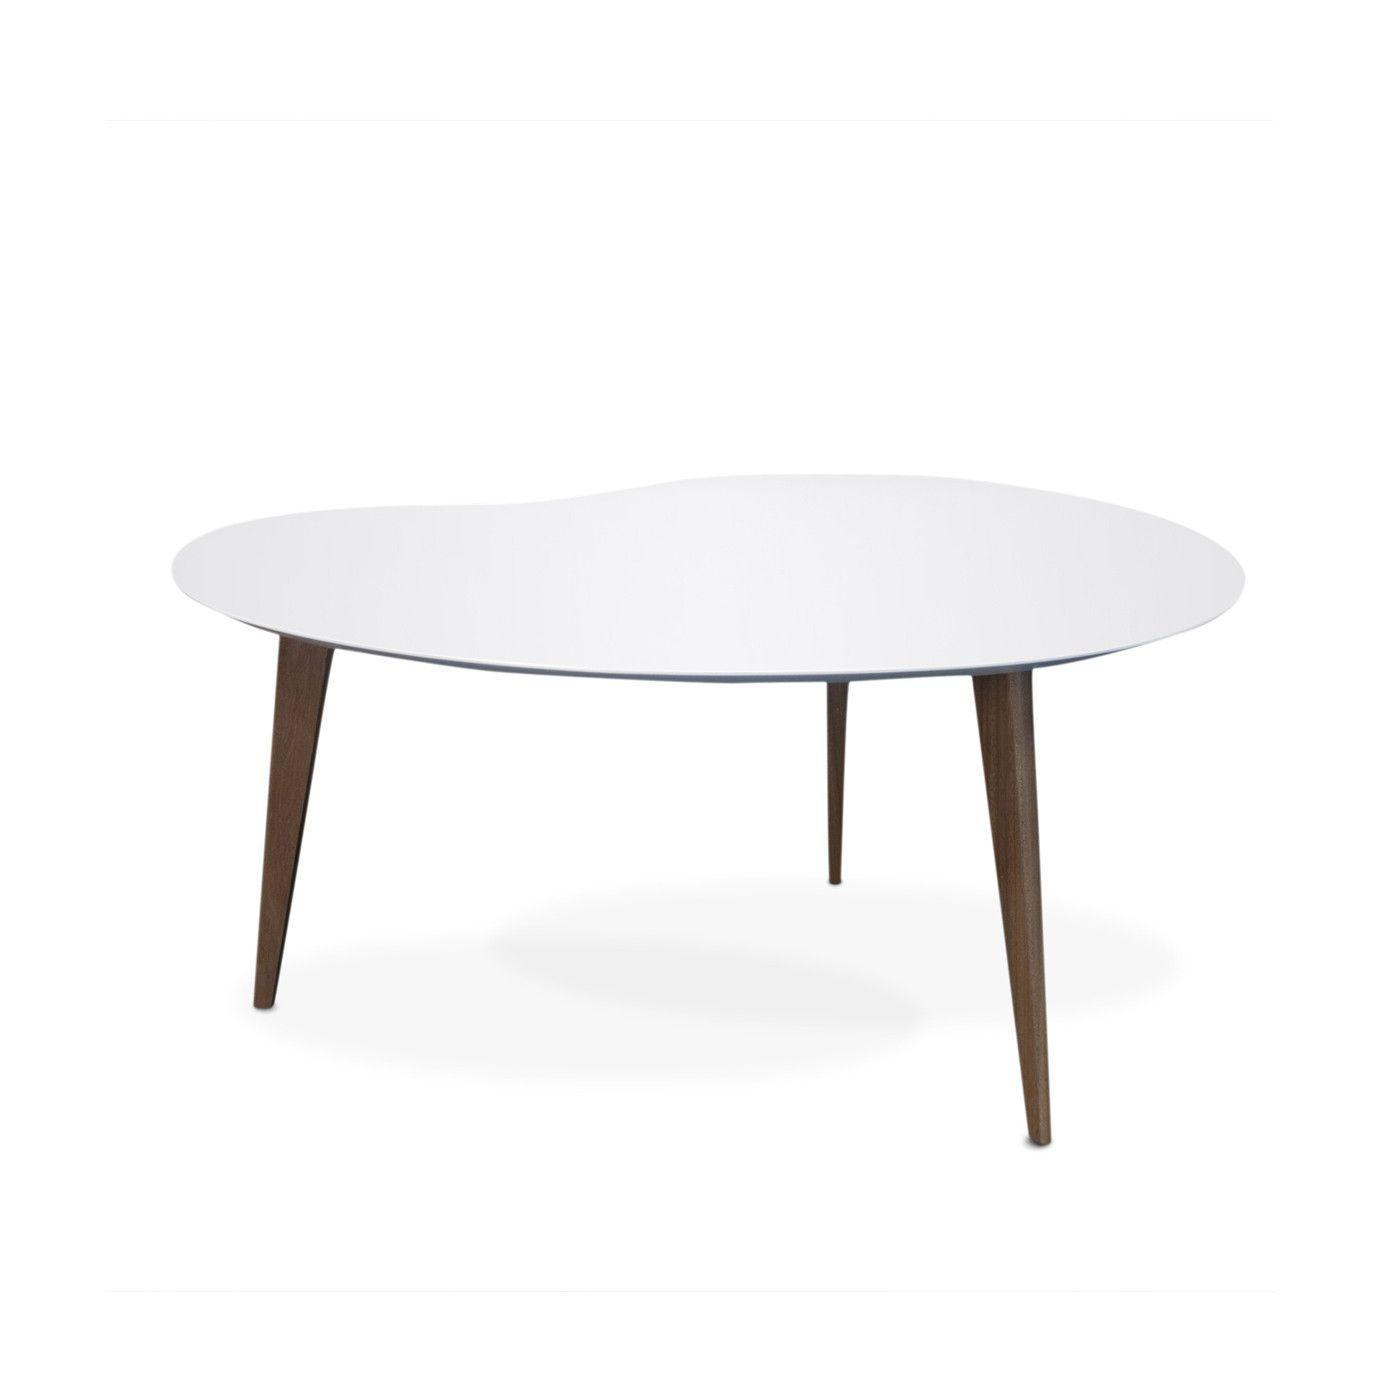 Jonathan Adler Okura Kidney Coffee Table Coffee Table Table Kidney Table [ 1400 x 1400 Pixel ]